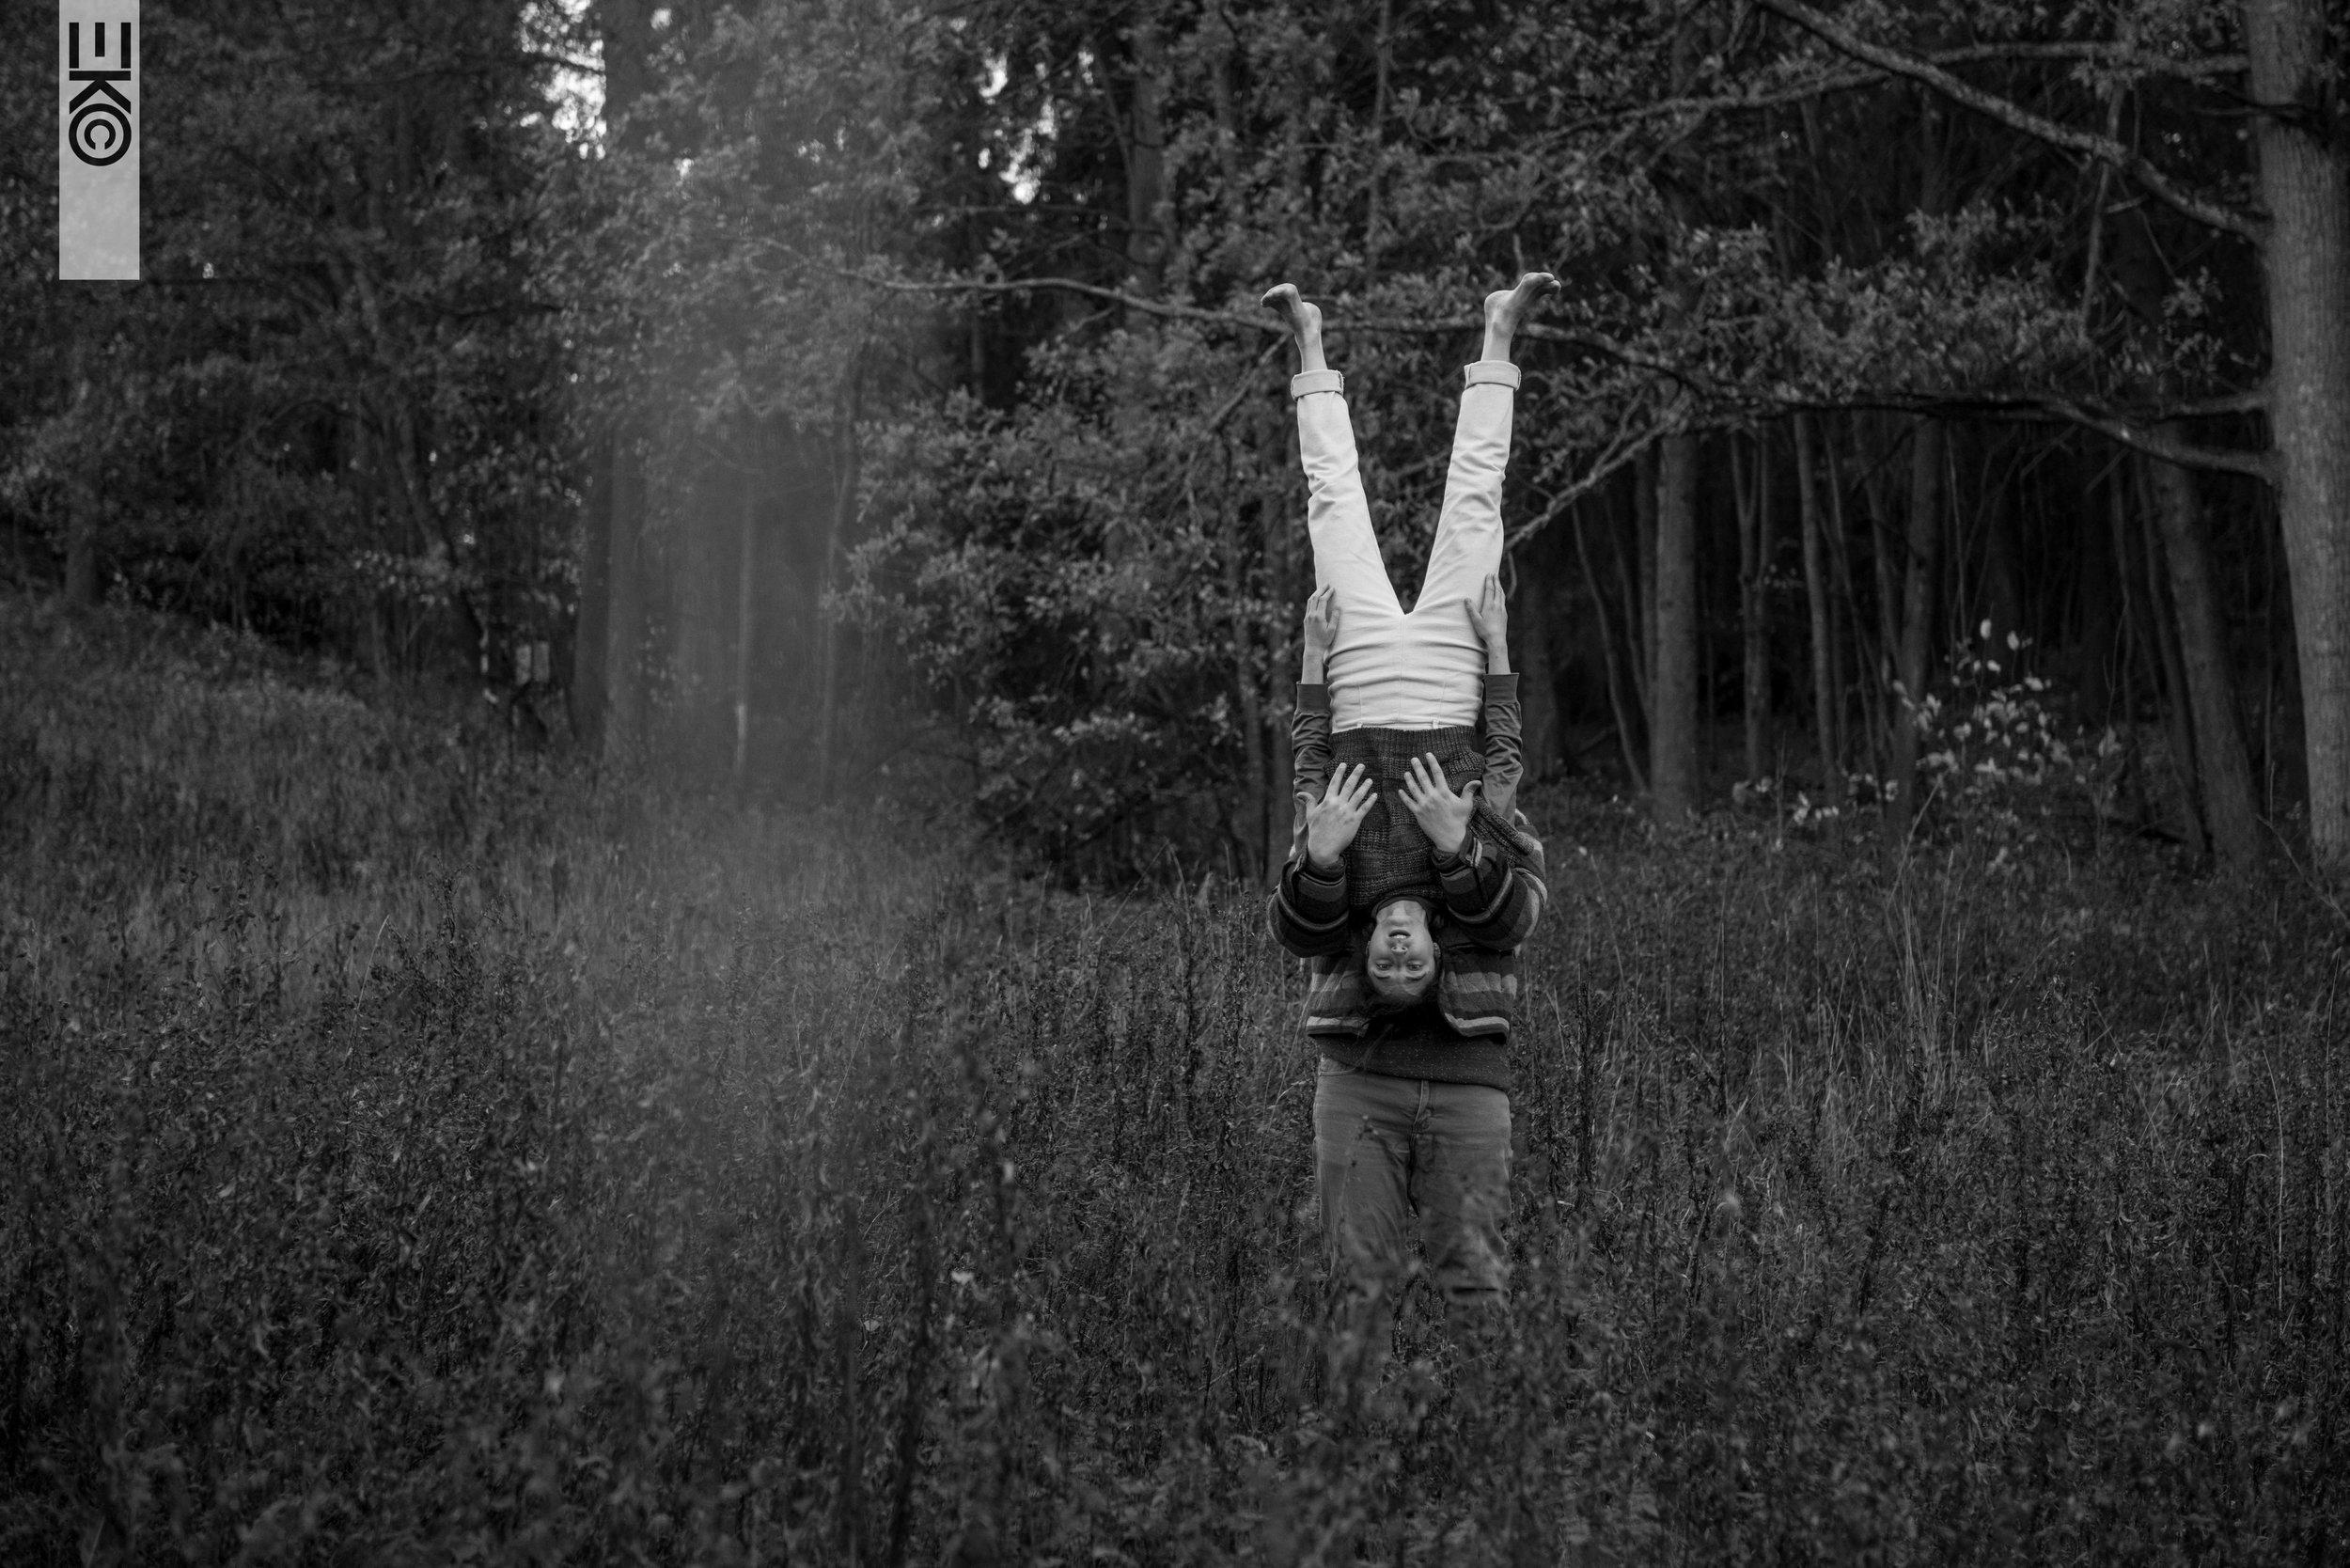 Photo: Einar Kling-Odencrants